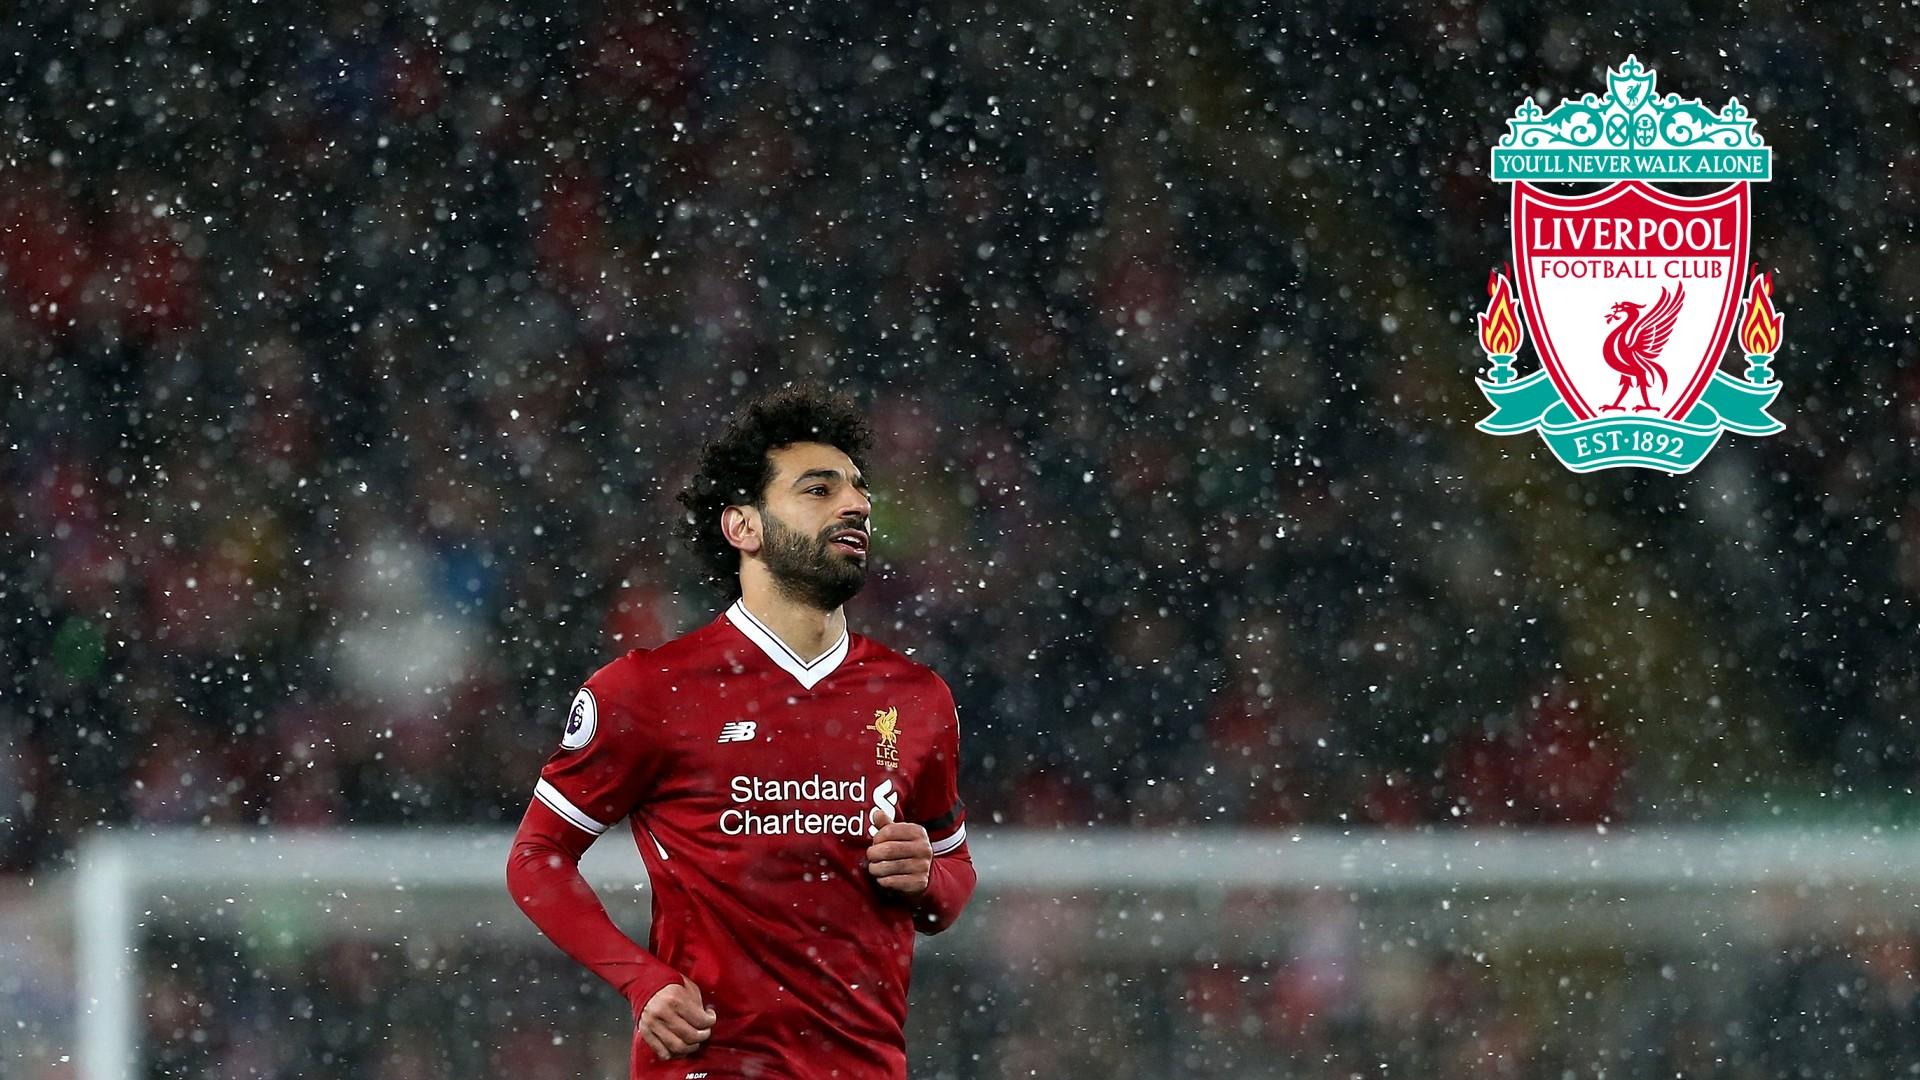 Mohamed Salah Liverpool Desktop Wallpaper With Image - Liverpool Desktop Wallpaper In Hd - HD Wallpaper